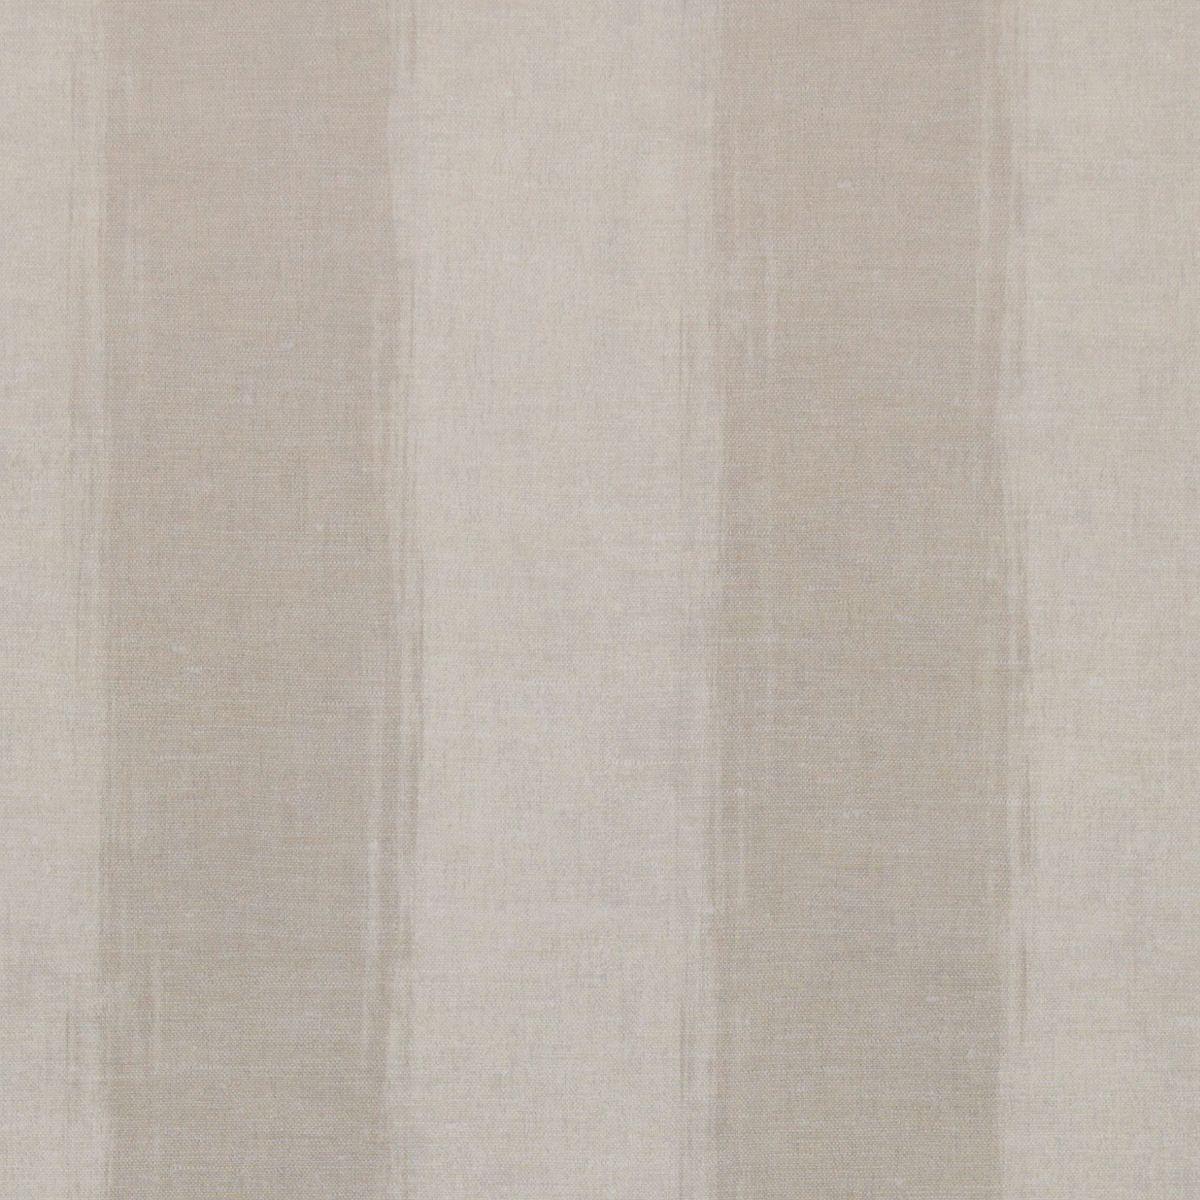 hochwertige tapeten und stoffe b n wallcoverings vliestapete riviera maison 18361 decowunder. Black Bedroom Furniture Sets. Home Design Ideas